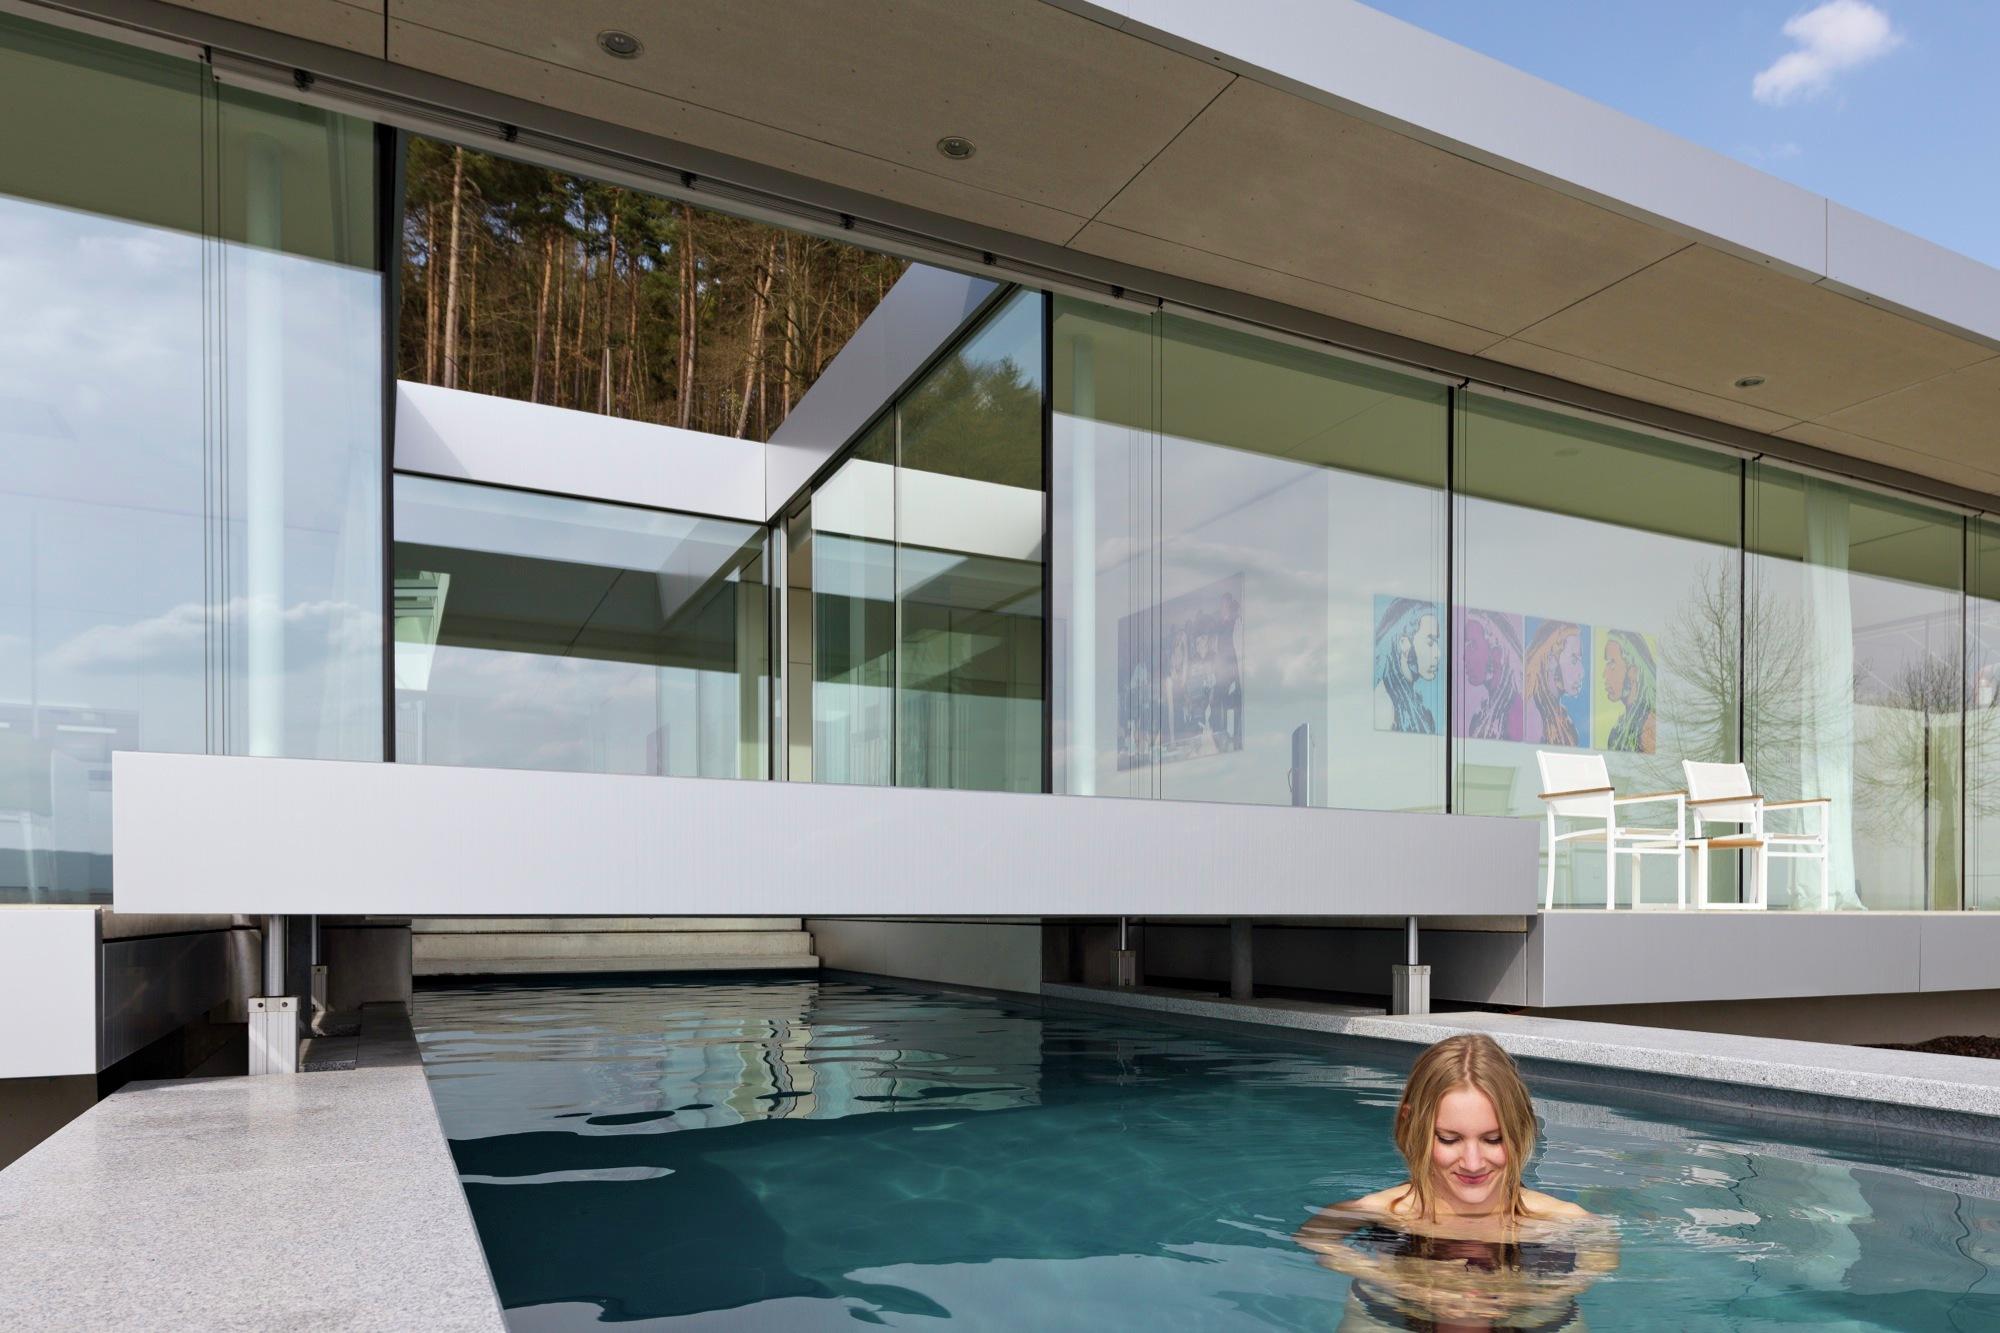 Galeria de Residência K / Paul de Ruiter Architects - 8